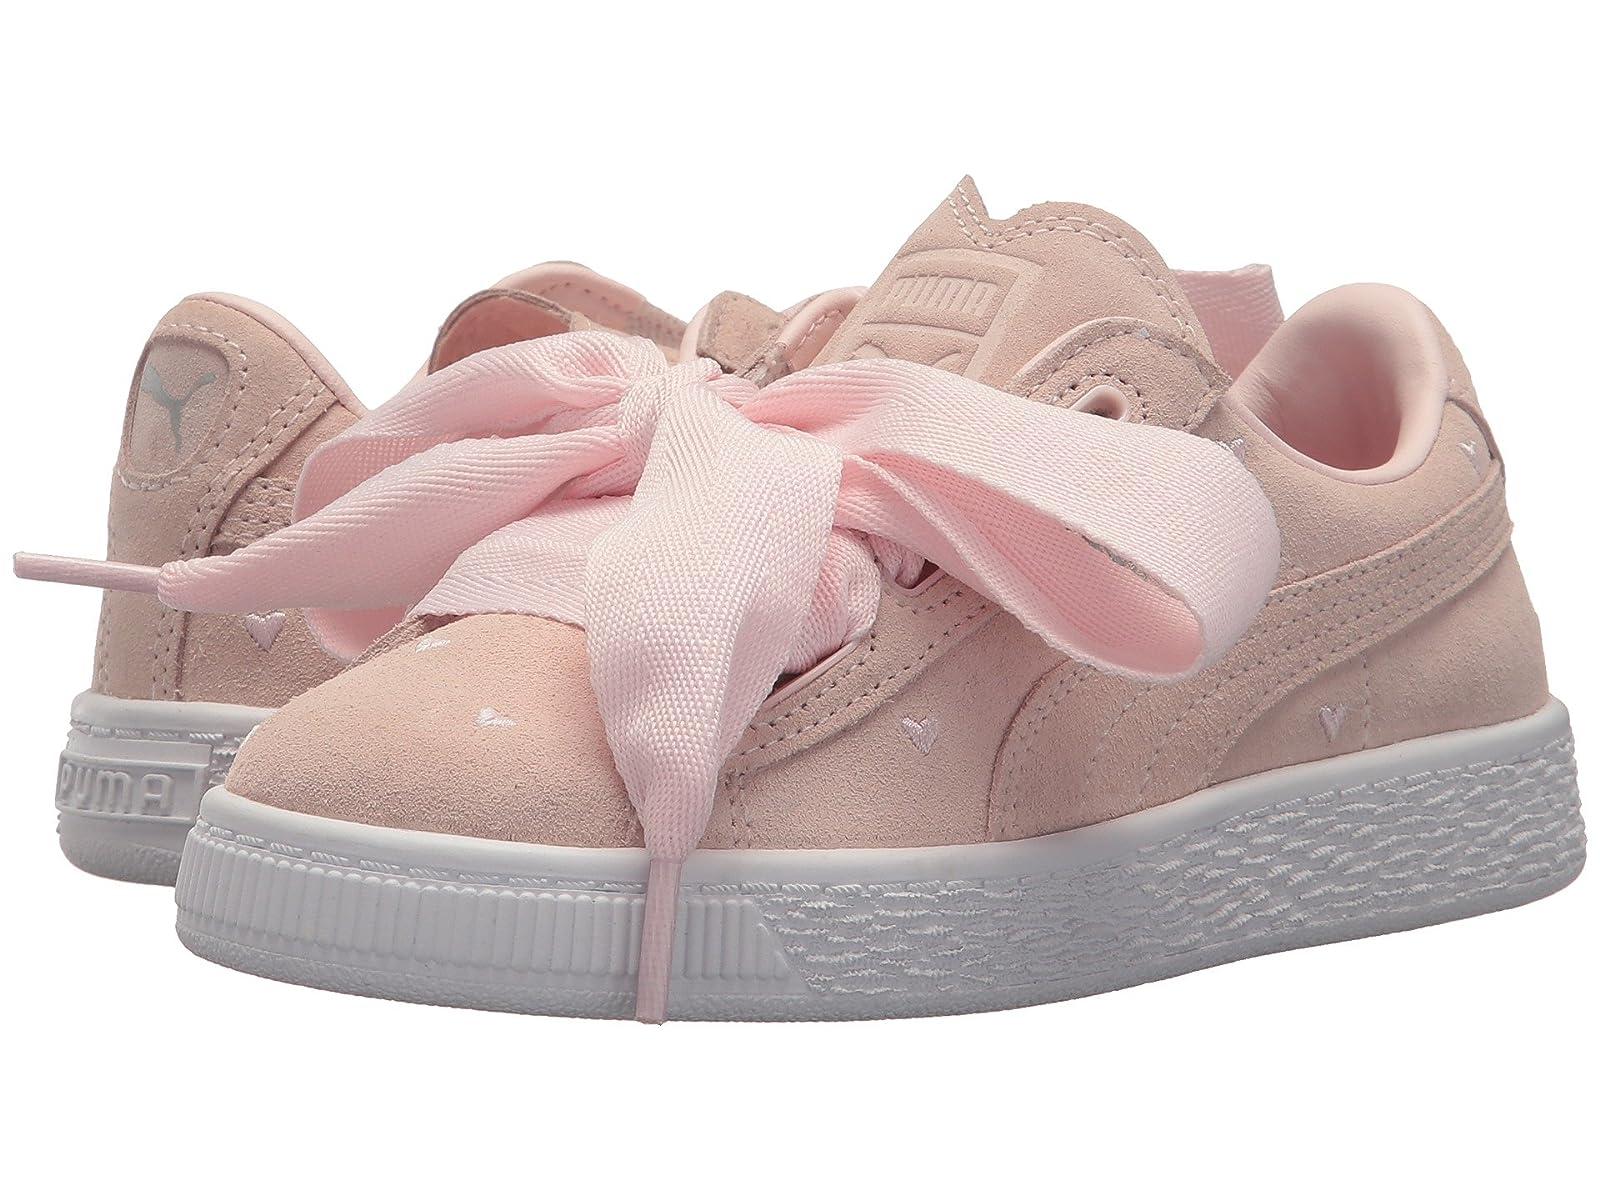 Puma Kids Suede Heart Valentine (Little Kid)Atmospheric grades have affordable shoes